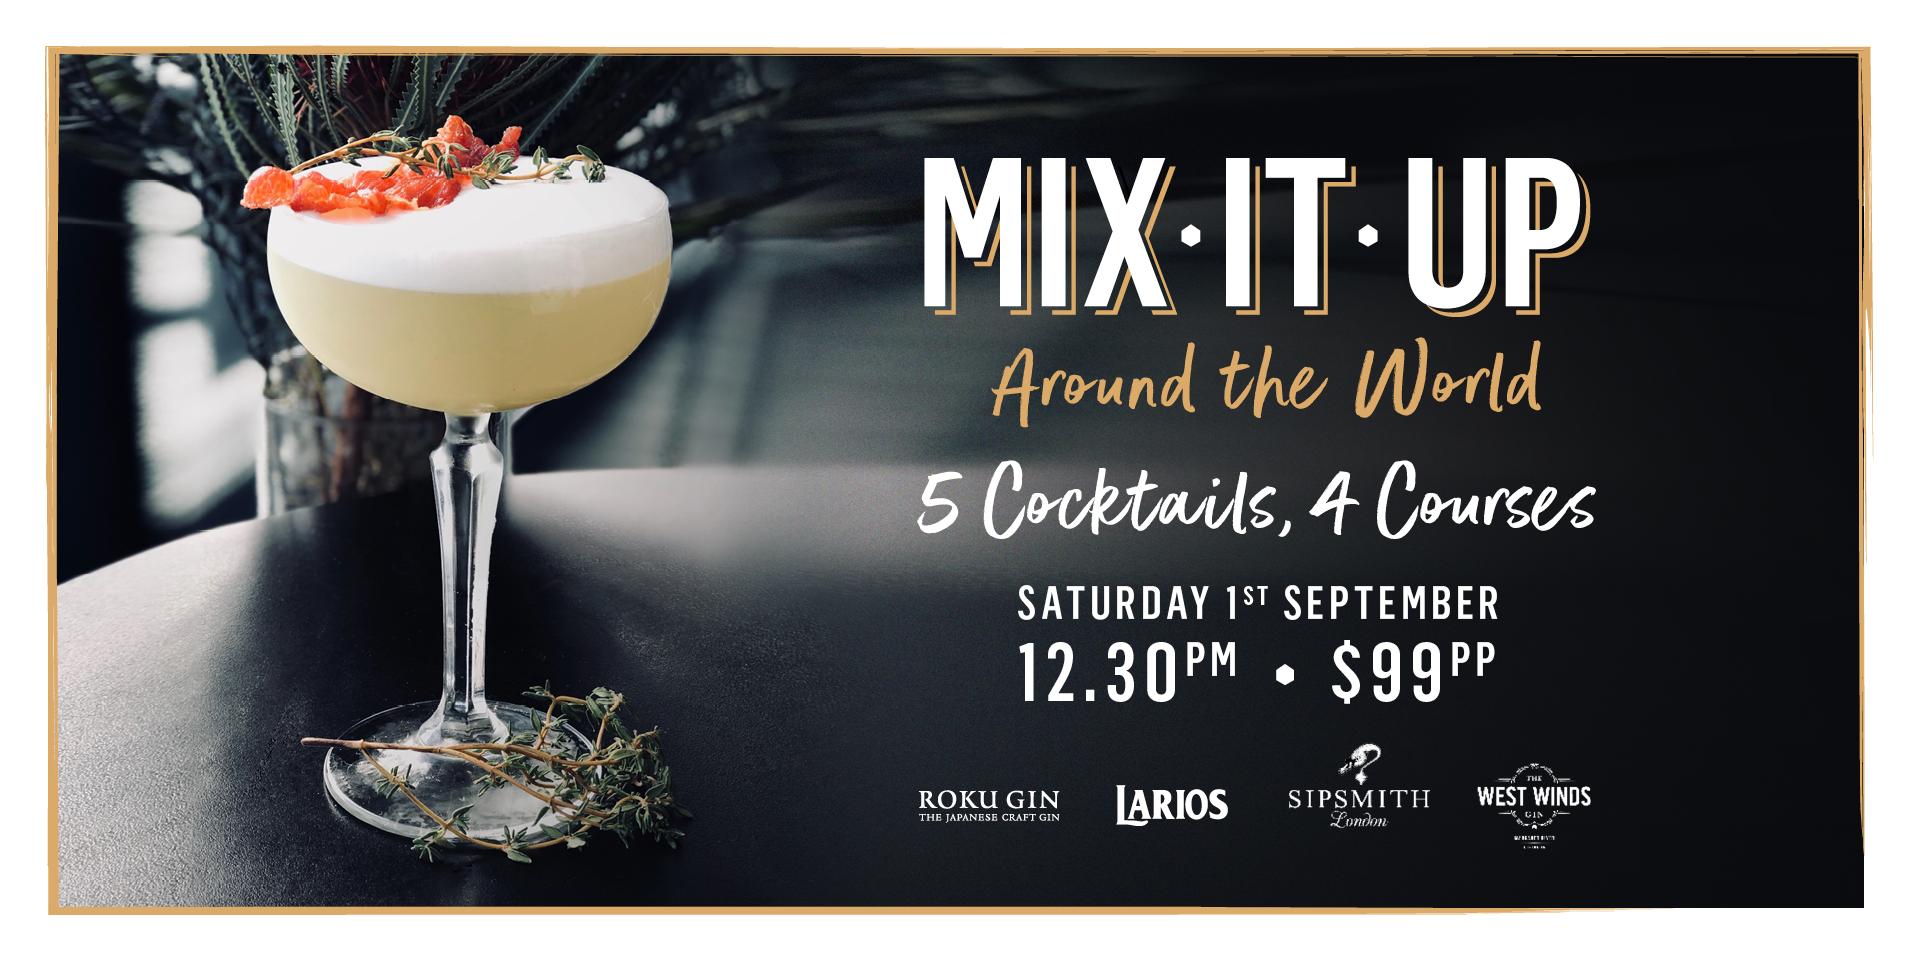 Rev_Mix It Up_Sept 18_Eventbrite.png